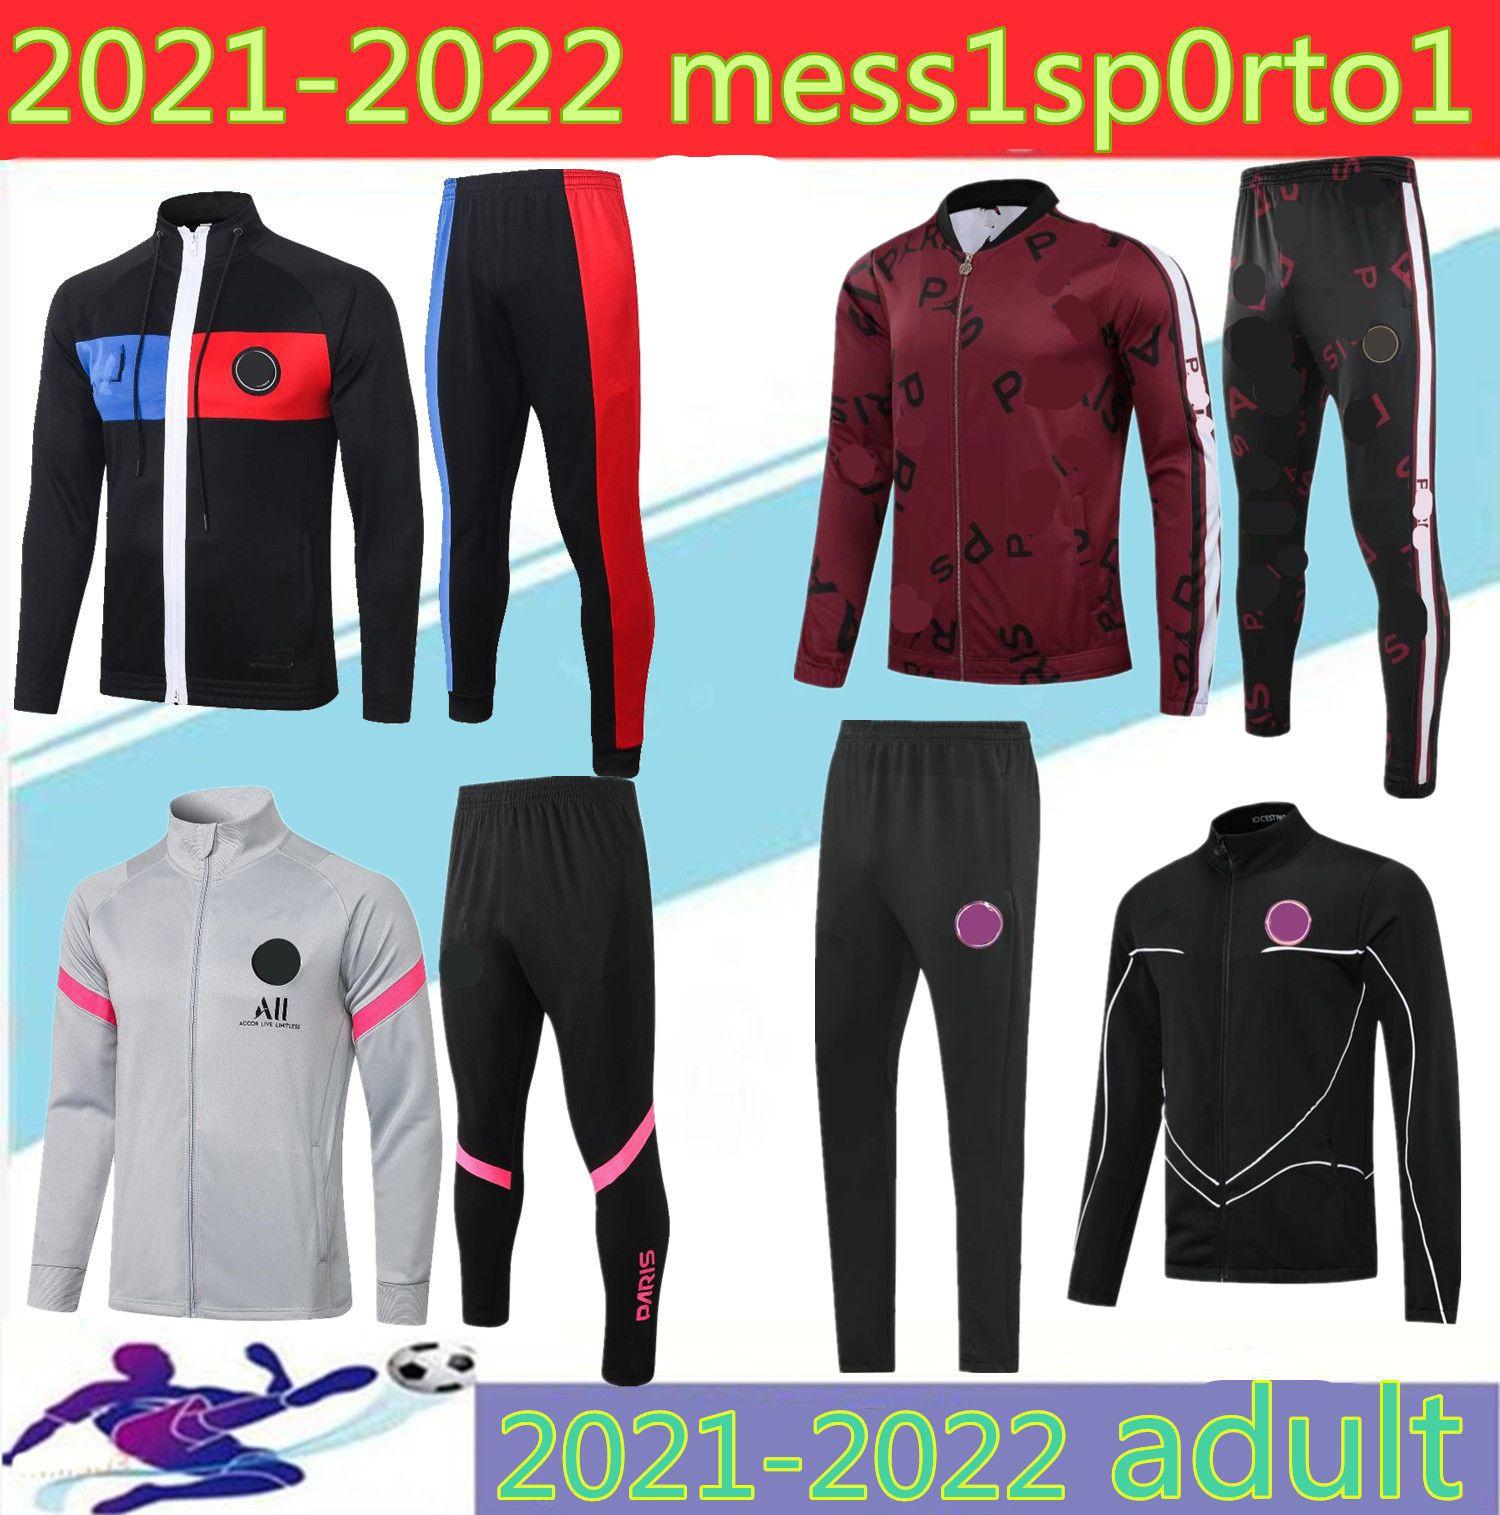 2021 PAR Tracksuit 자켓 까마귀 실질 20 21 샹들리 풋볼 Mbappe 축구 재킷 축구